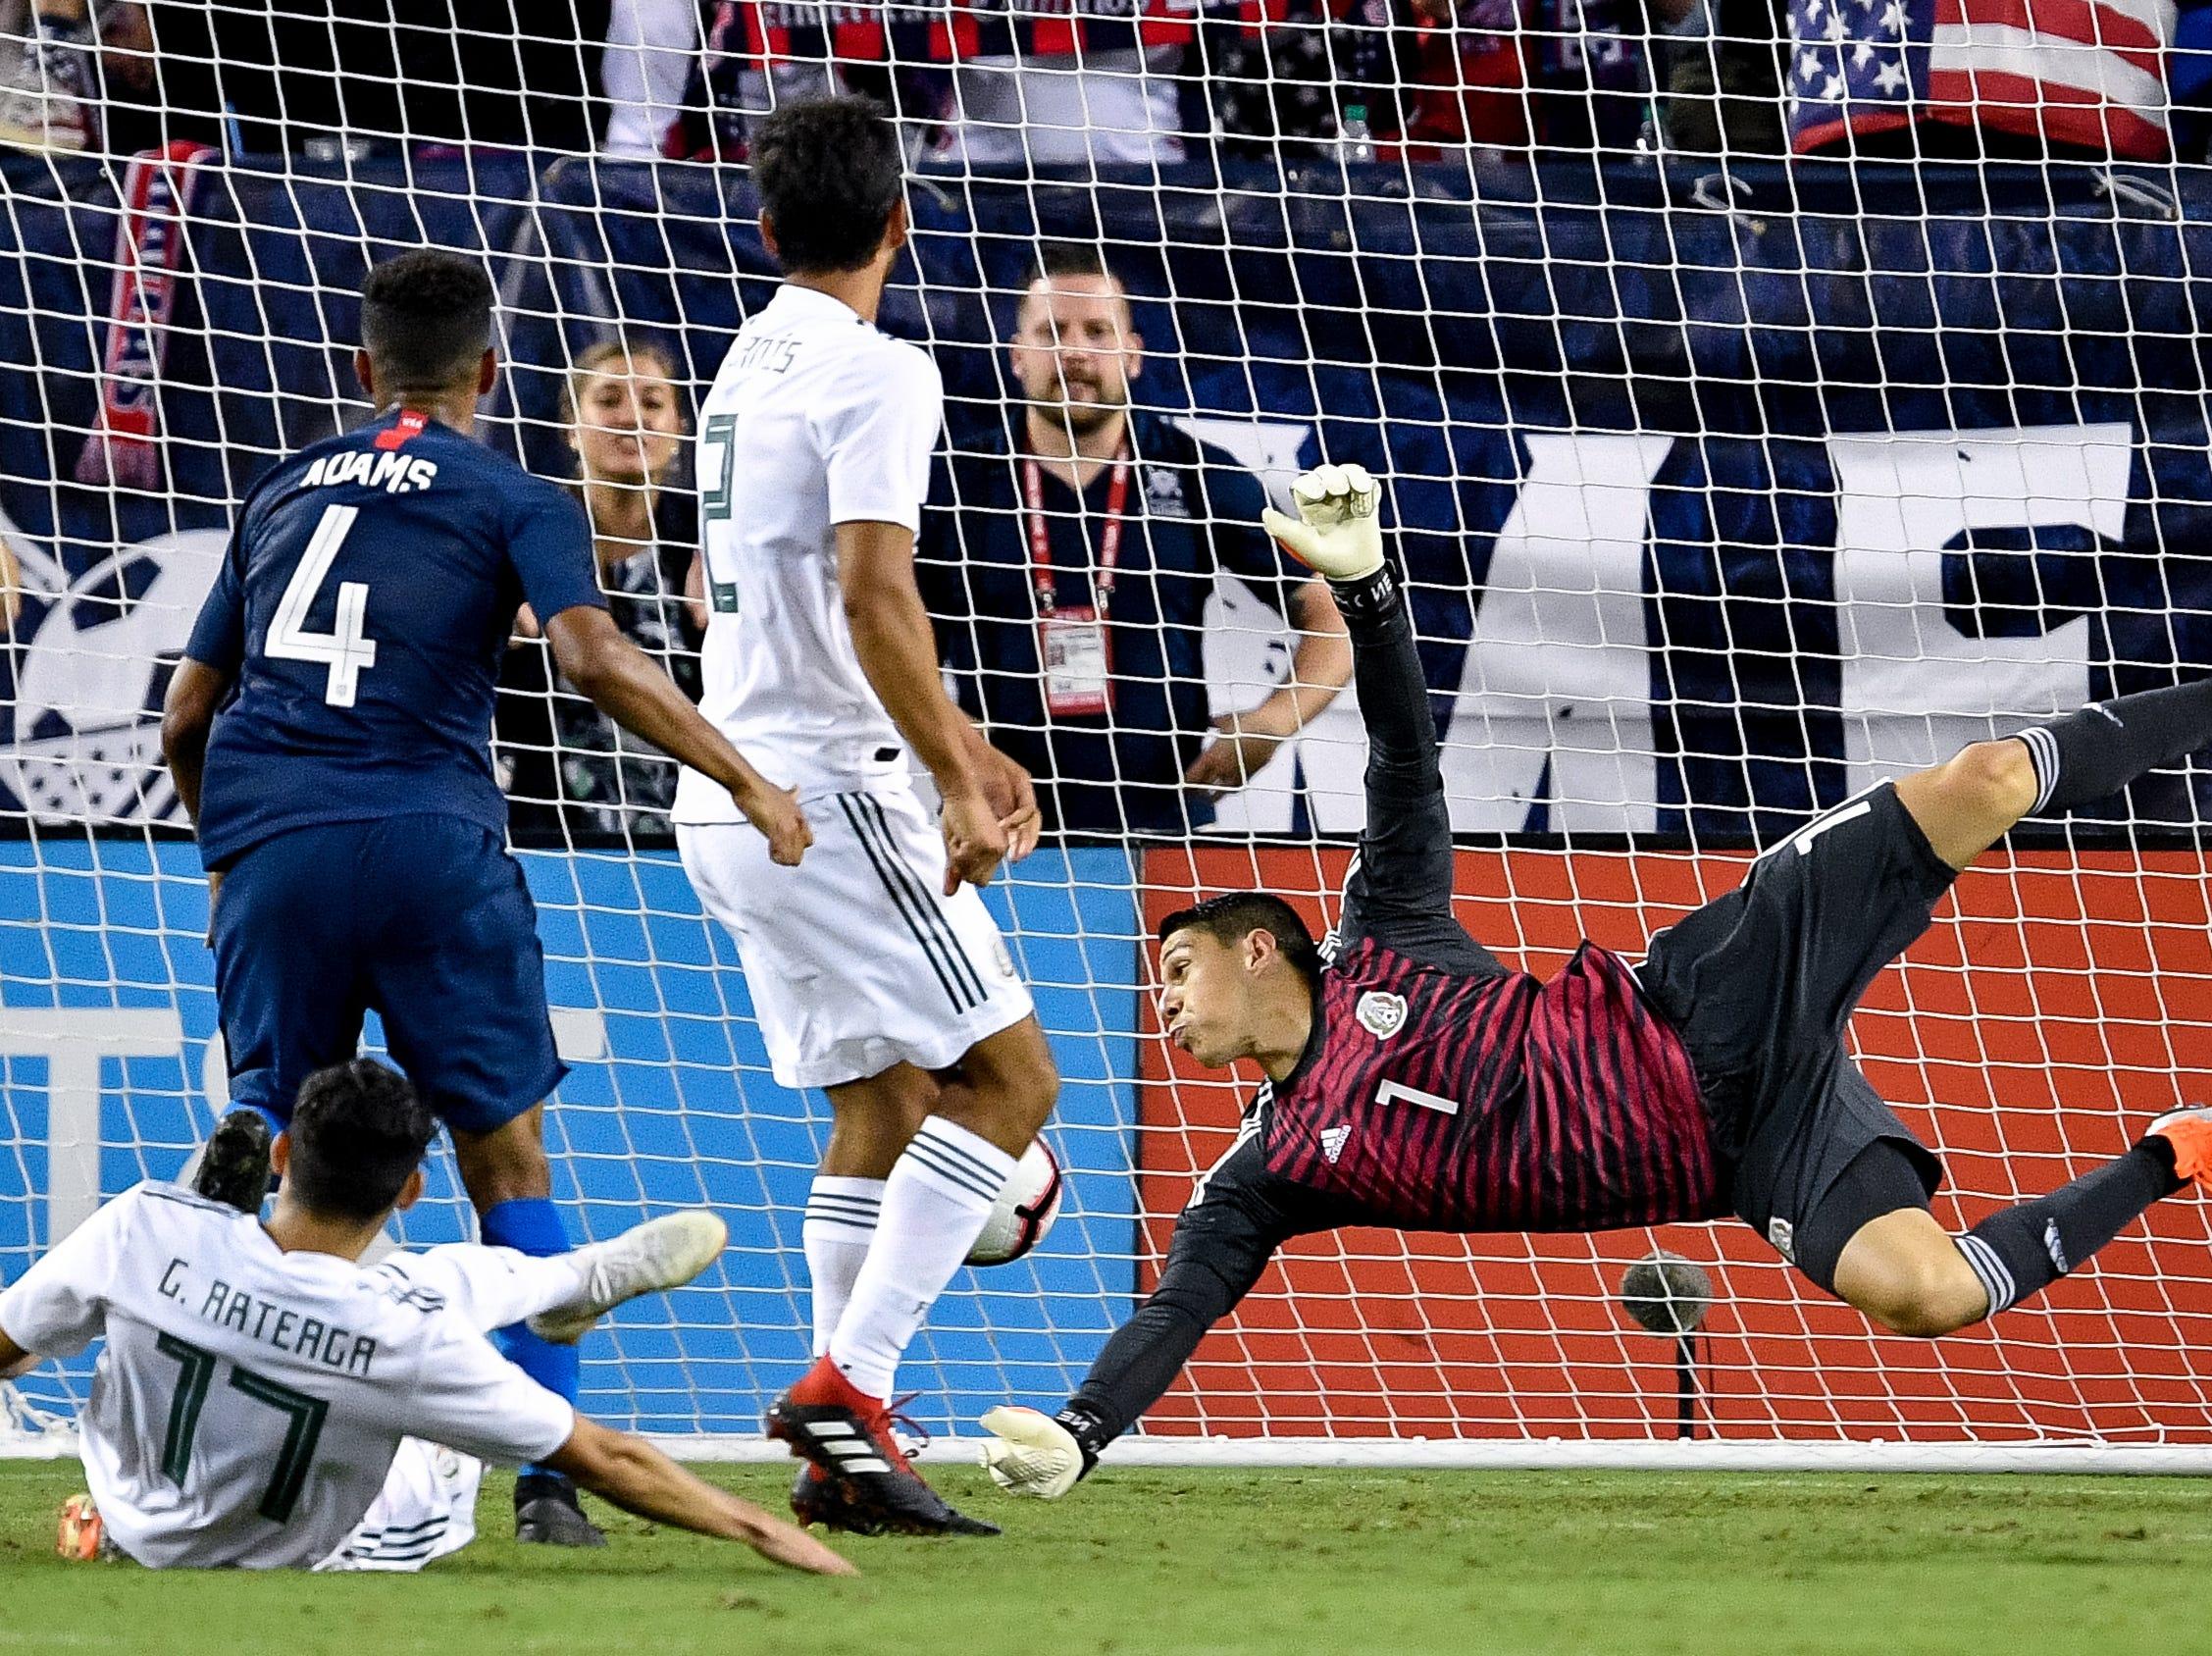 USA midfielder Tyler Adams (4) scores past Mexico goalkeeper Hugo Gonzalez (1) during the second half at Nissan Stadium in Nashville, Tenn., Tuesday, Sept. 11, 2018.